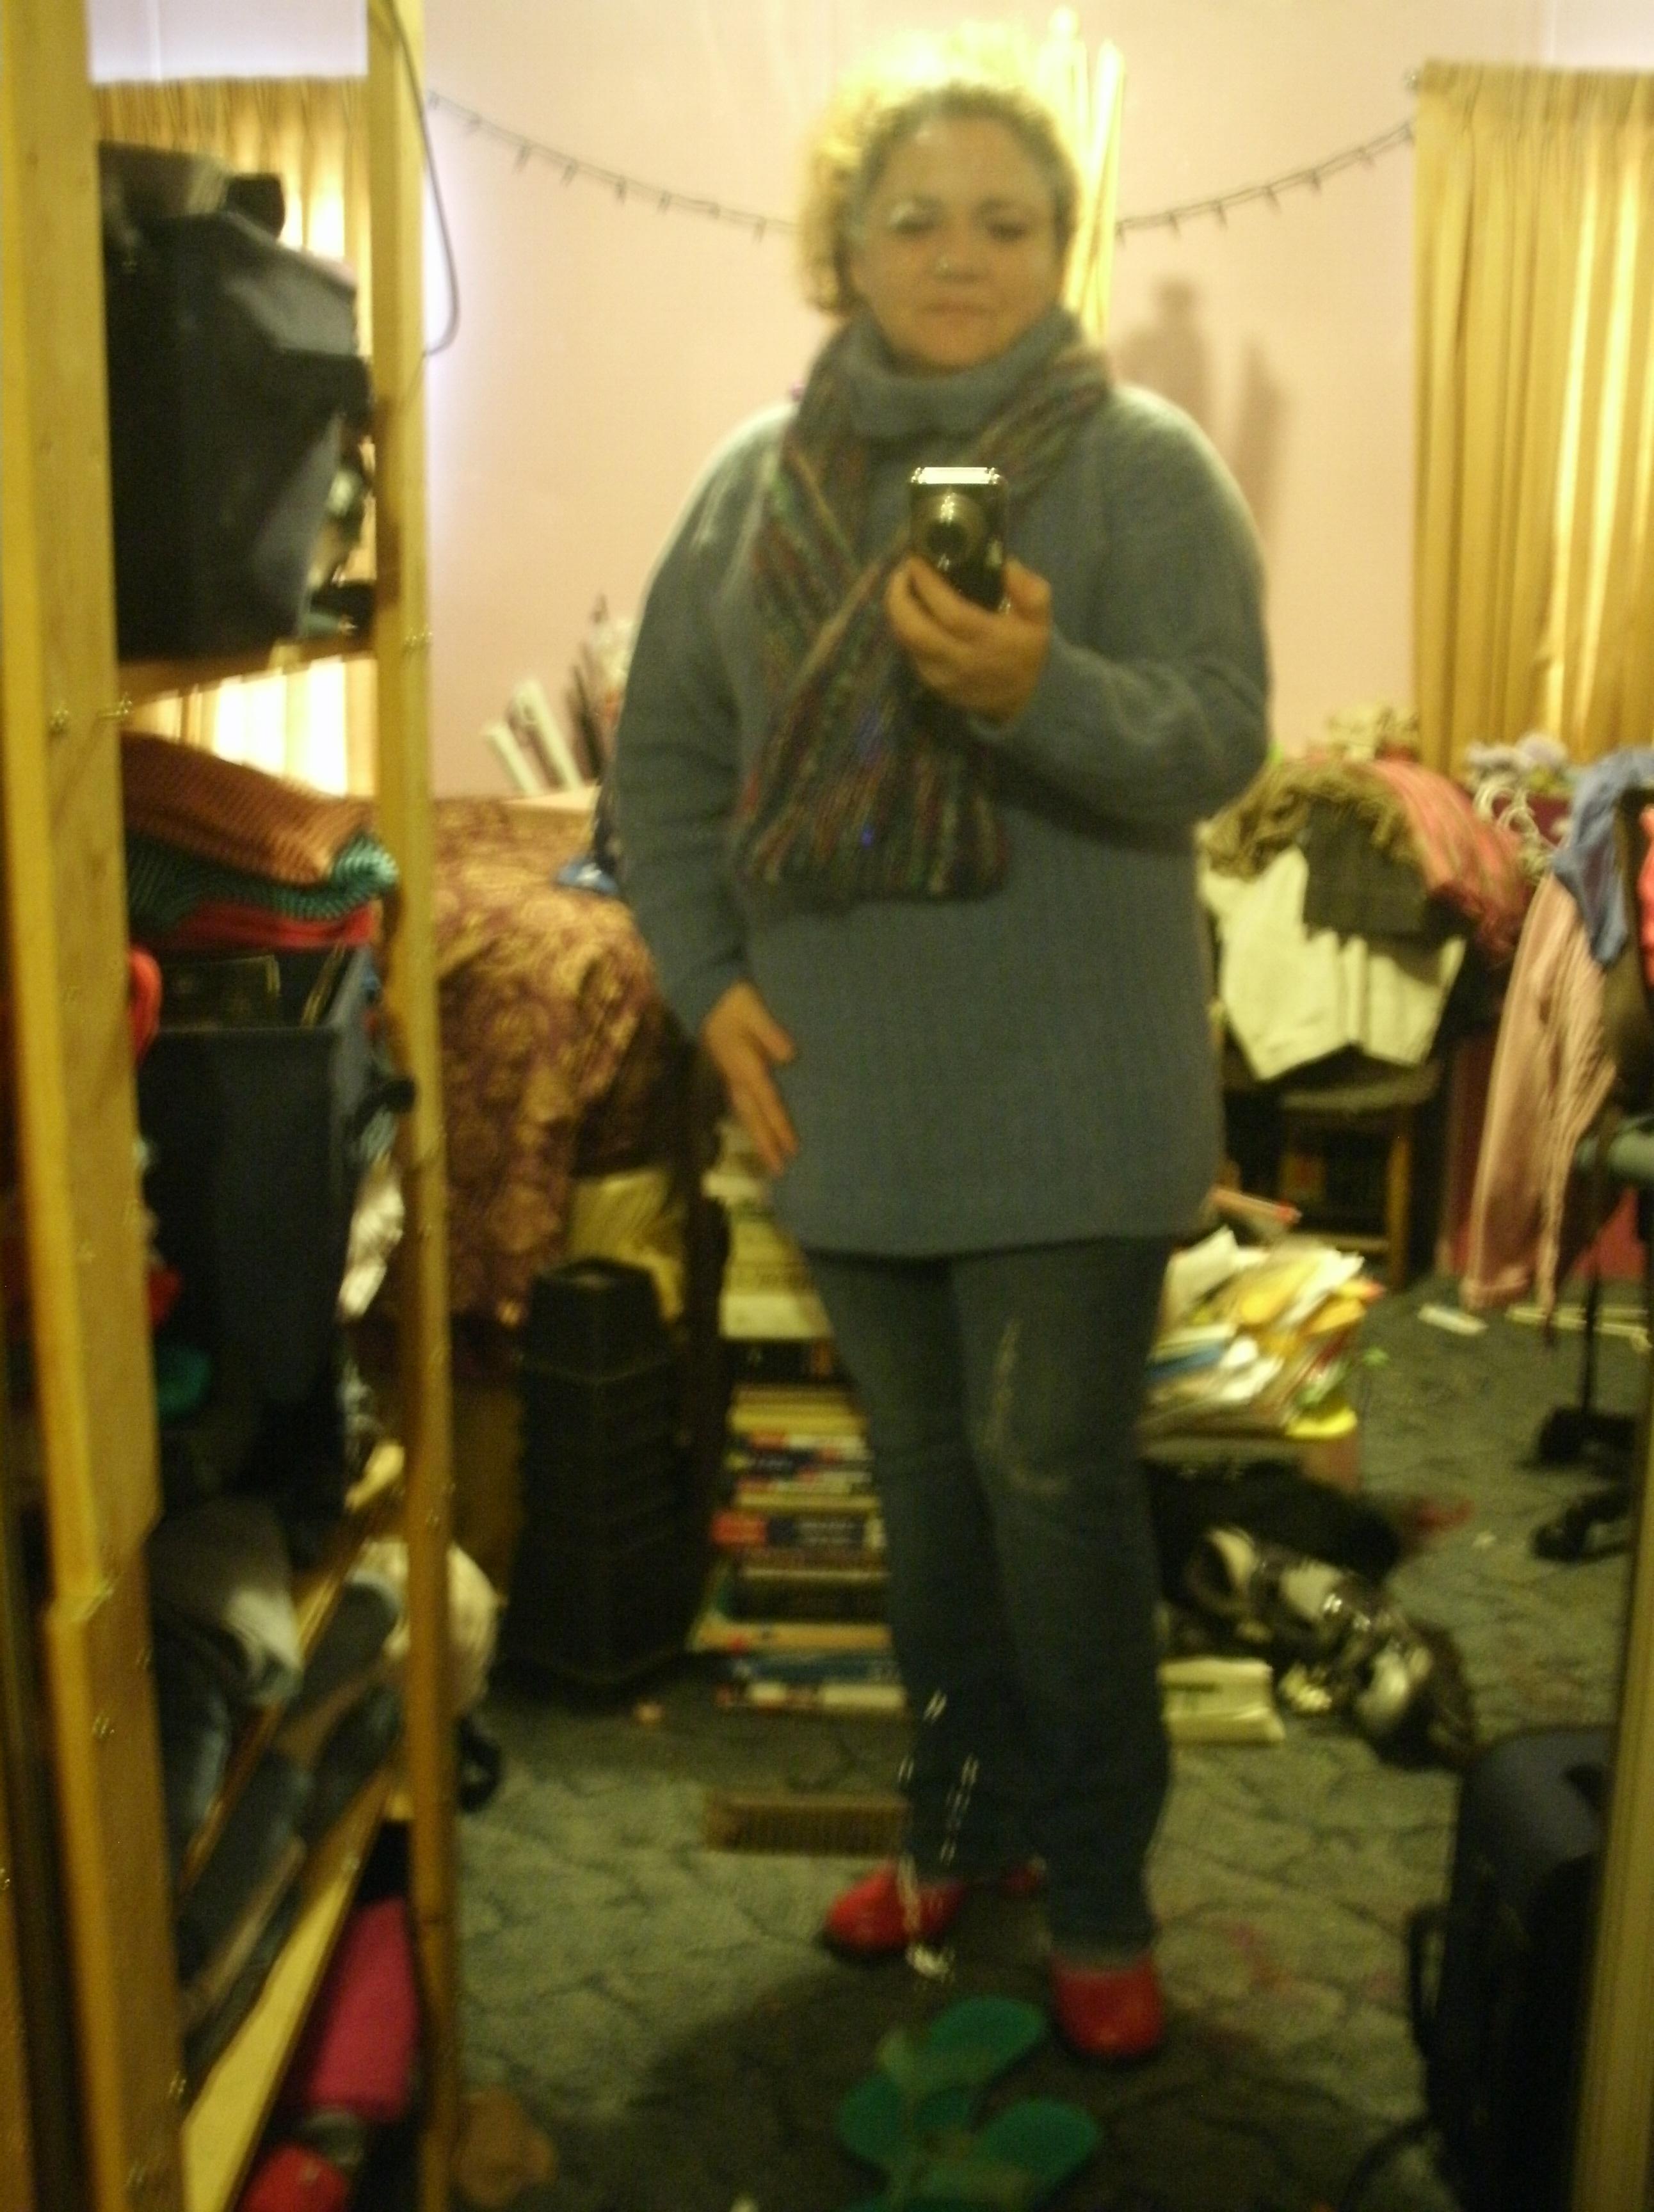 sweater jan 22